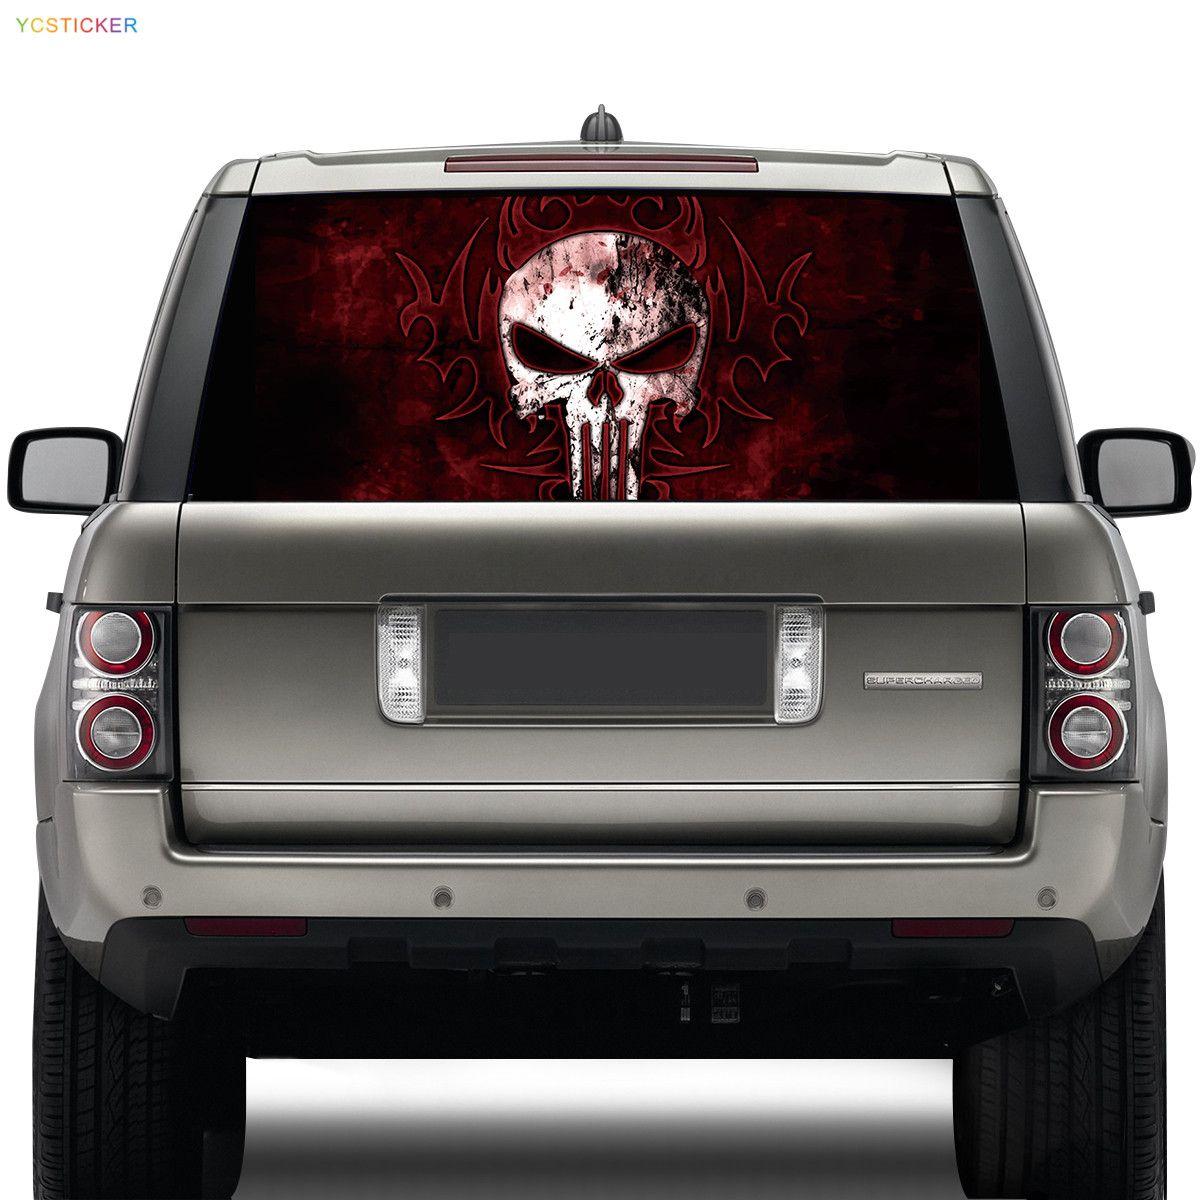 Personalized Skull Head Car Vinyl Wrap Stickermikiycstickercom - Window decals for vehicles personalized